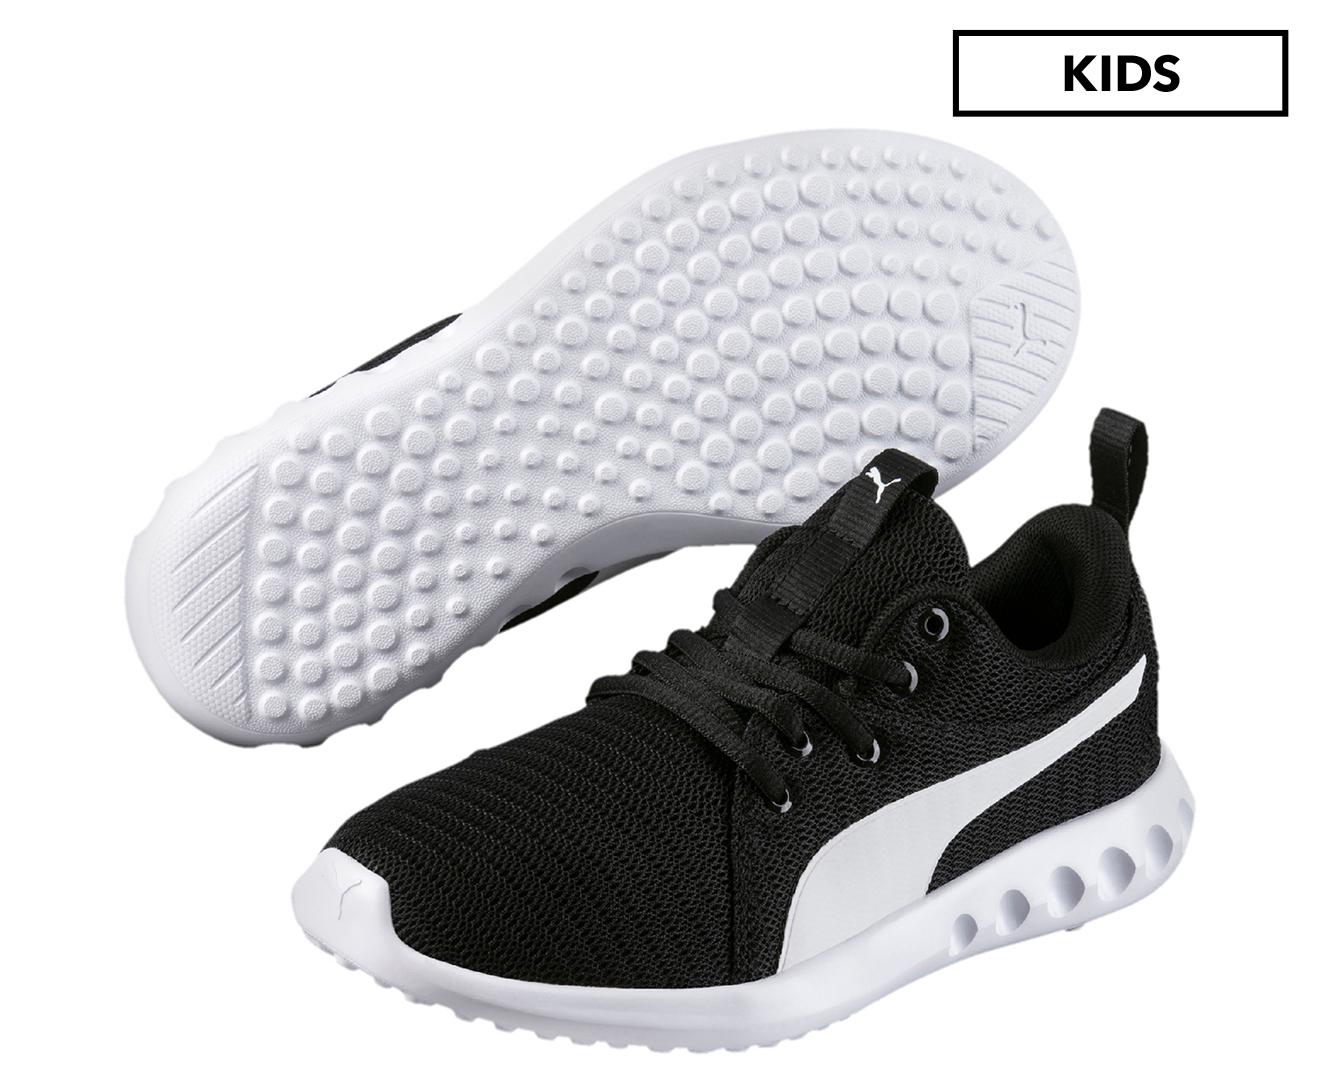 5c0d82dbfd7e PUMA Grade-School Boys  Carson 2 JR Training Shoe - Puma Black Puma White